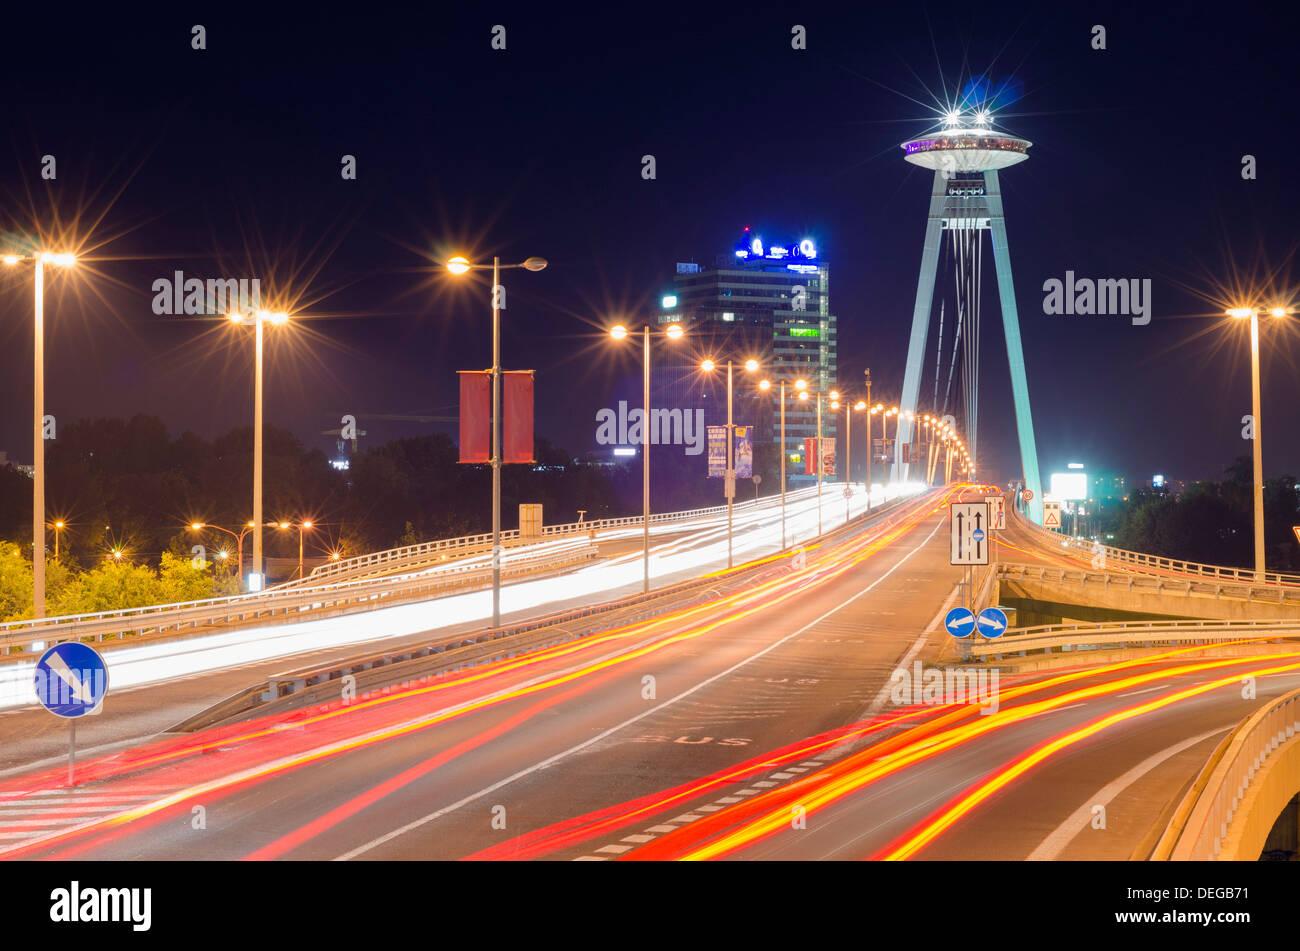 Novy Most Bridge and UFO viewing platform, Bratislava, Slovakia, Europe - Stock Image